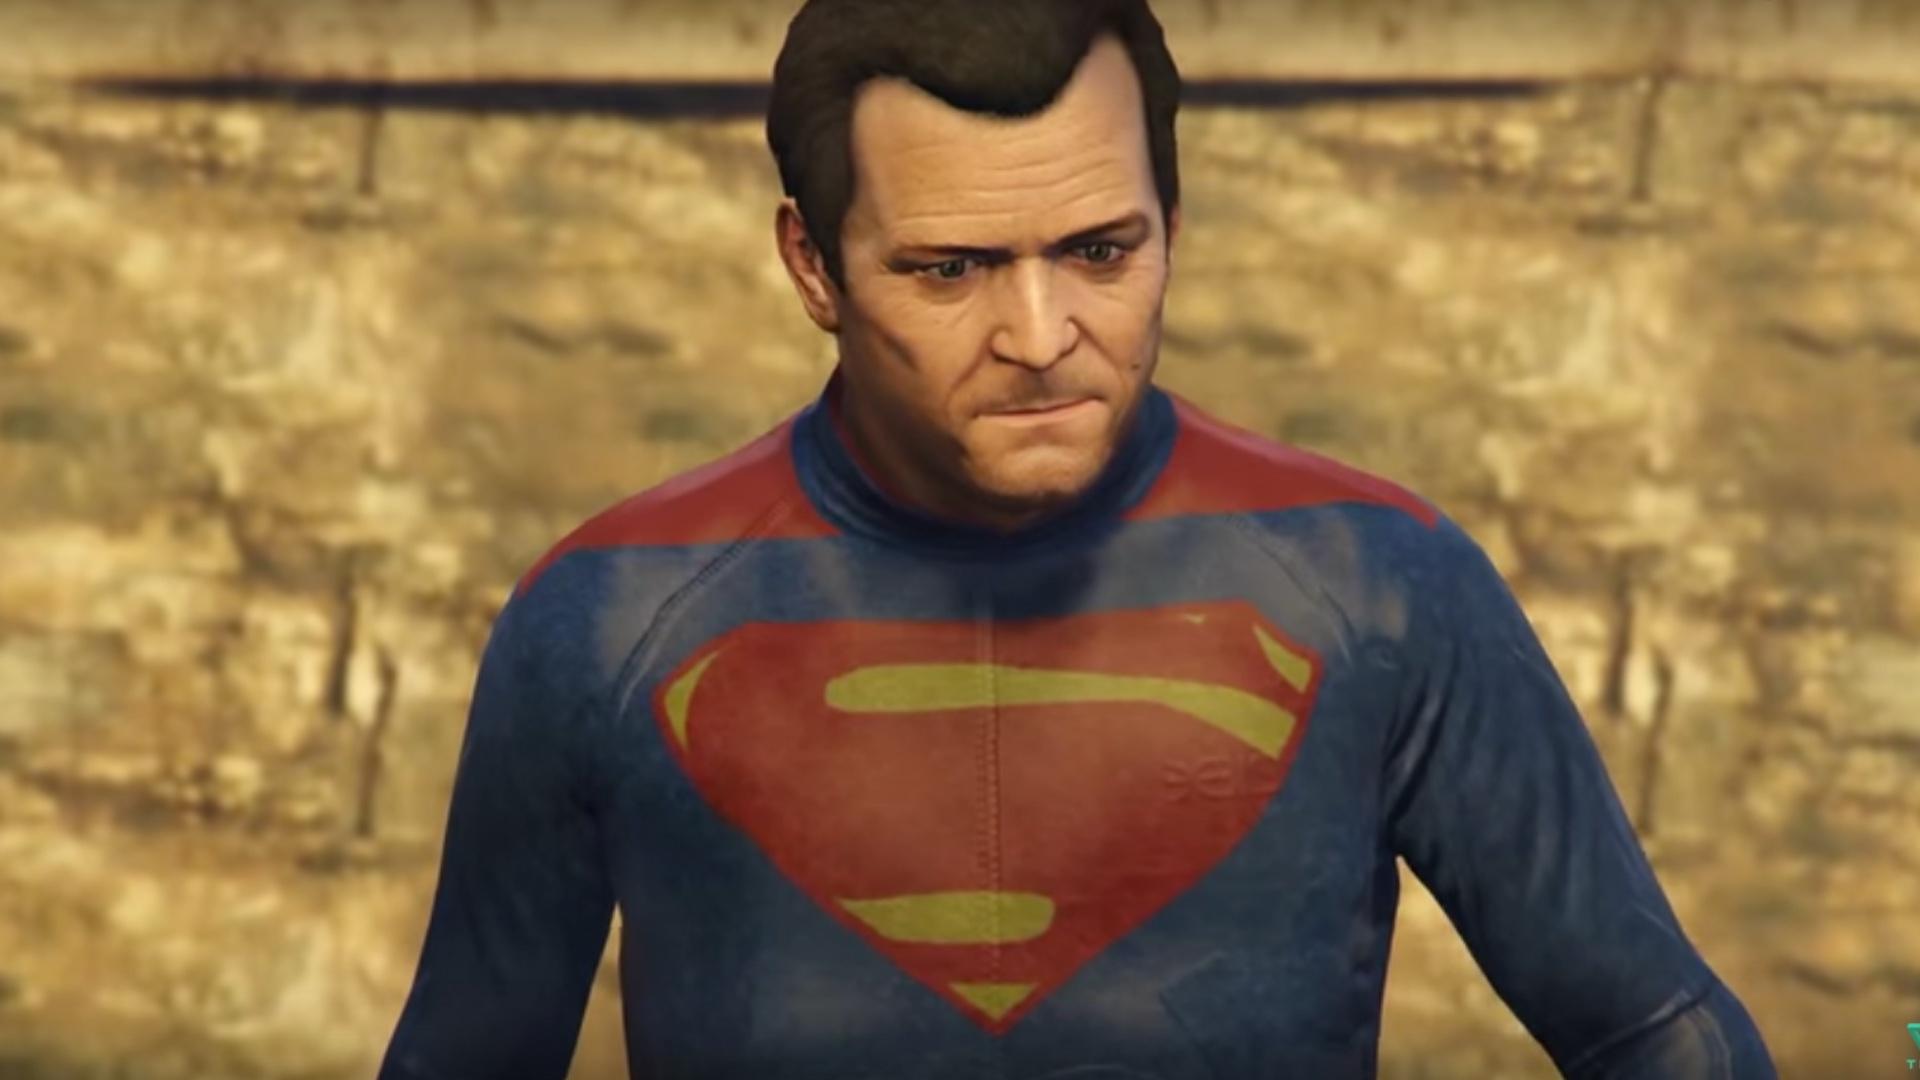 batman-v-superman-trailer-fantastically-recreated-in-gta-v